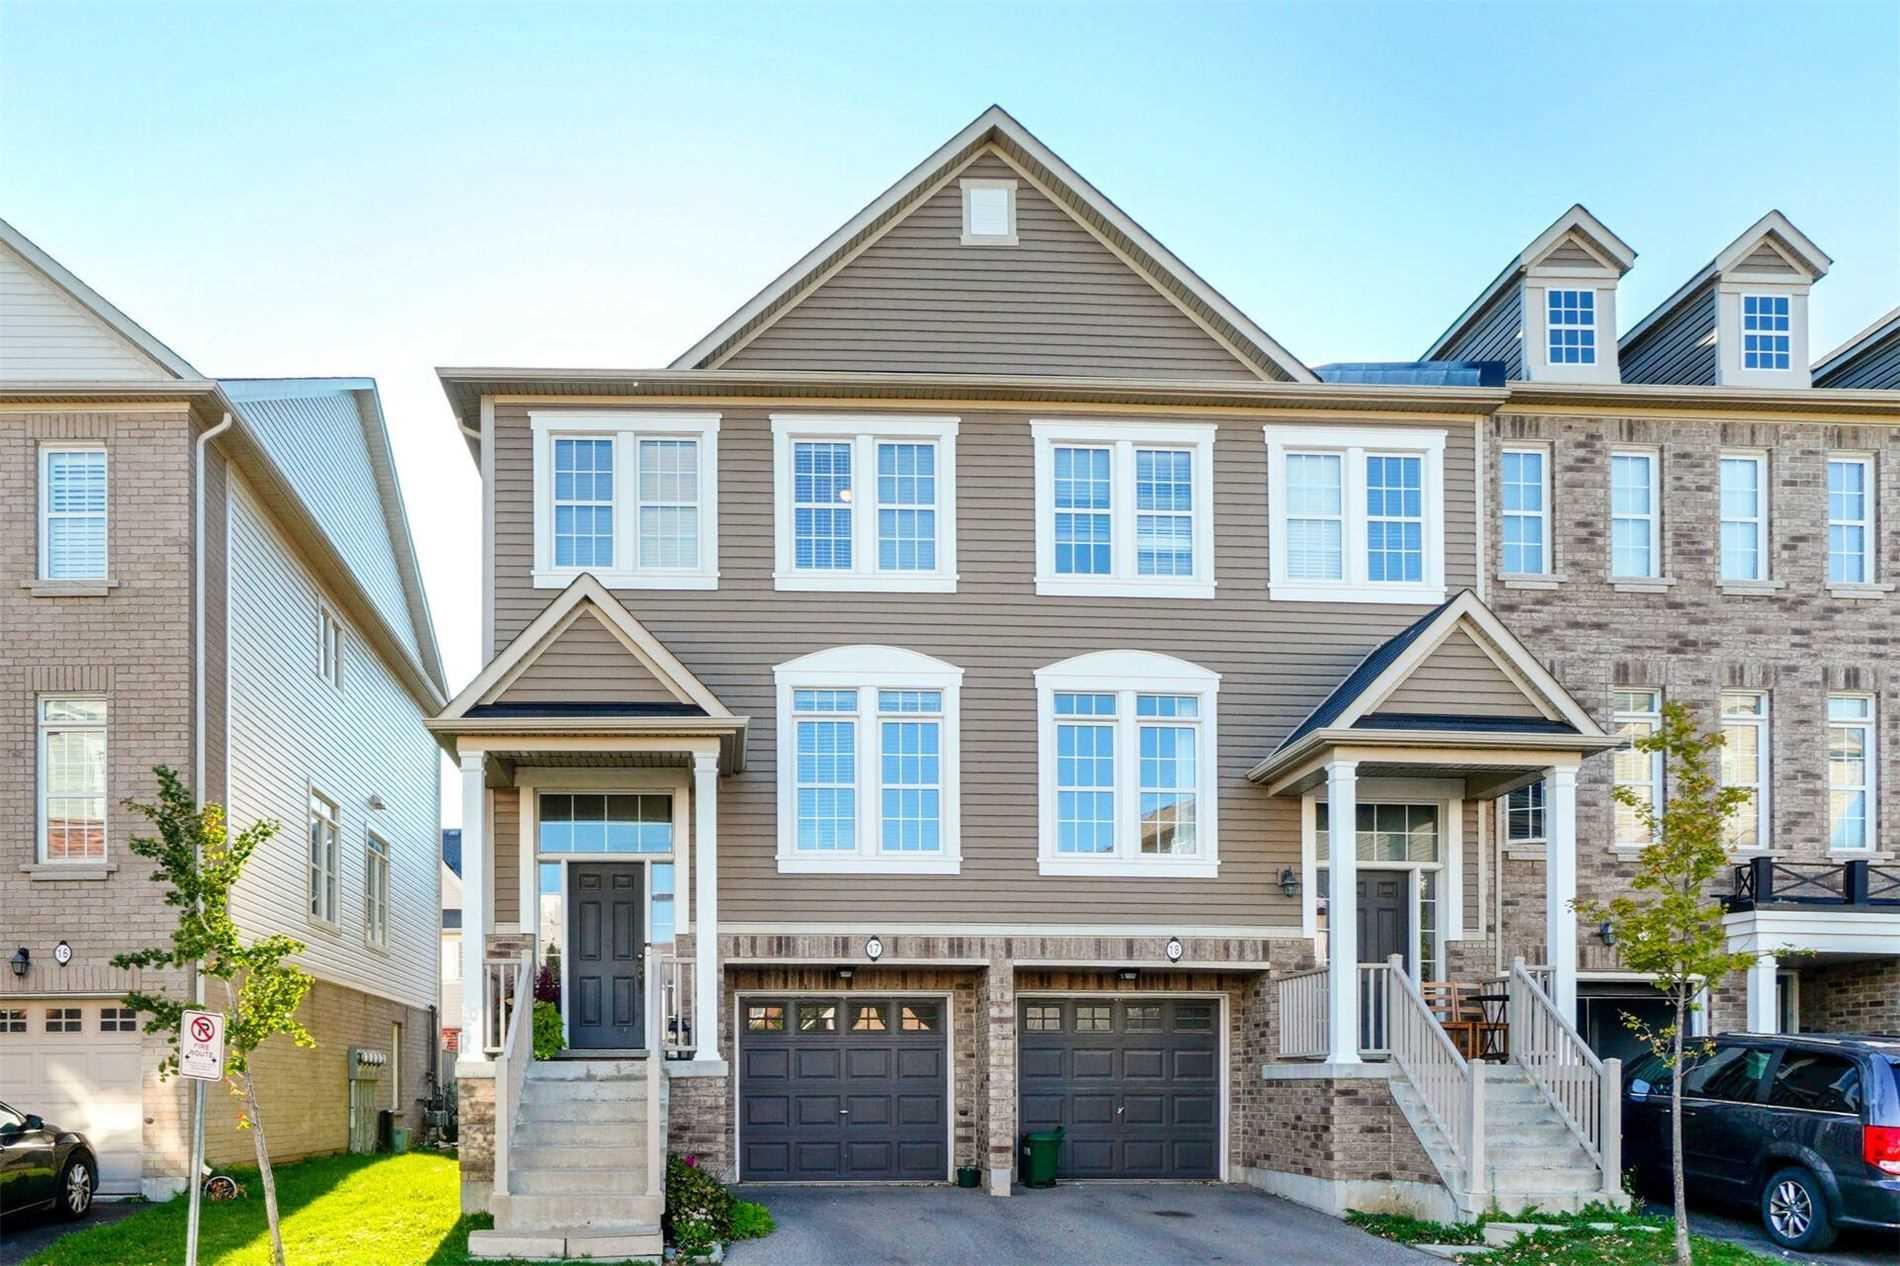 4823 Thomas Alton Blvd, Burlington, Ontario L7M0V2, 3 Bedrooms Bedrooms, ,3 BathroomsBathrooms,Condo Townhouse,For Lease,Thomas Alton,W5374335